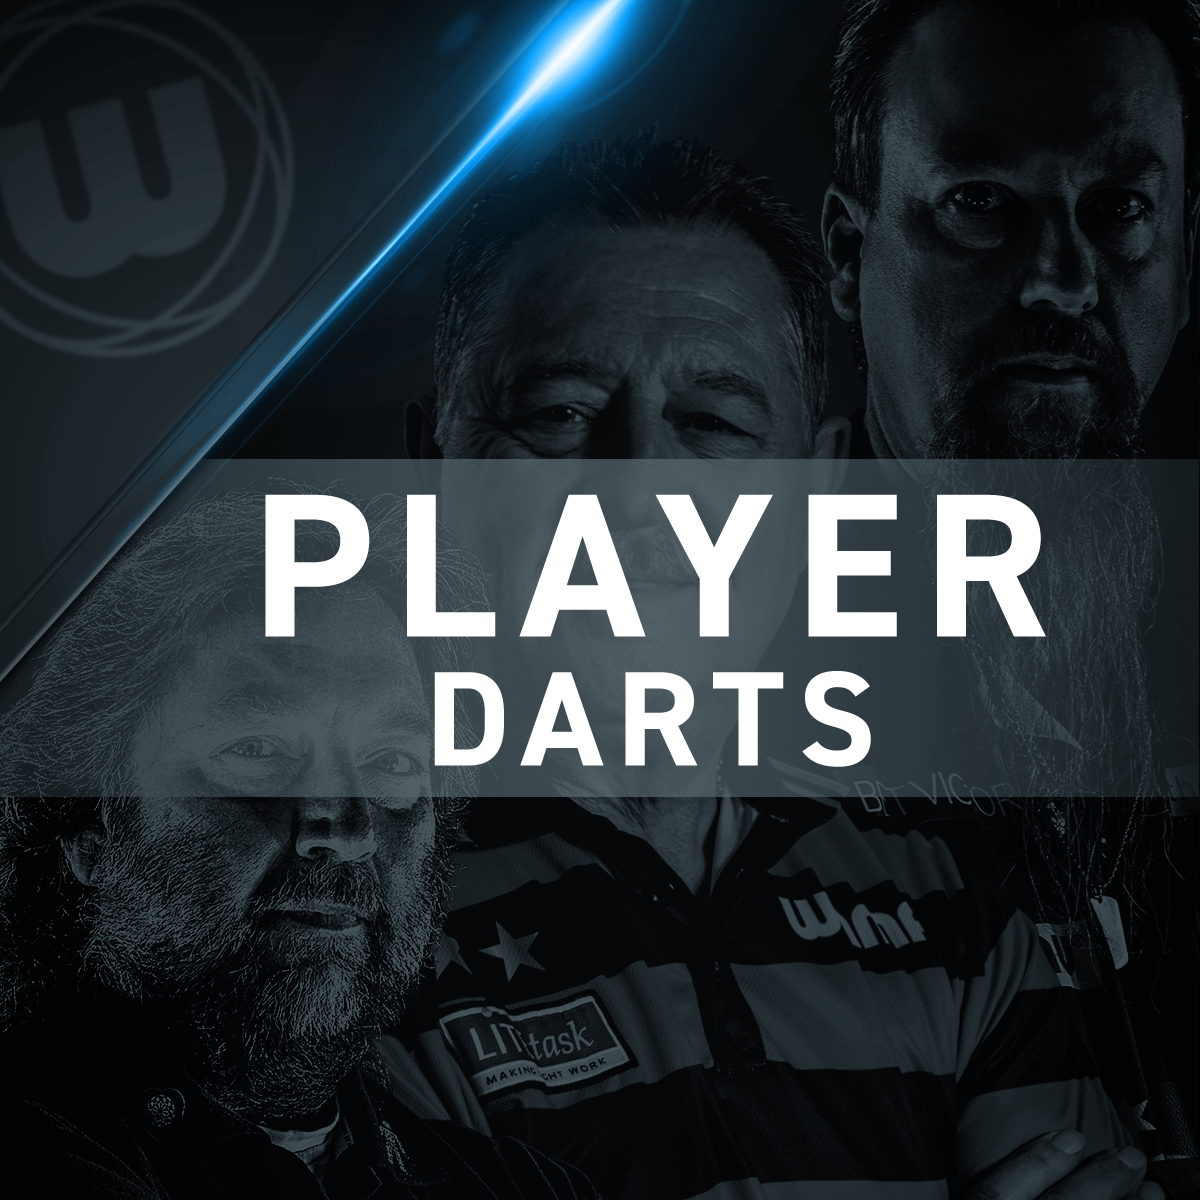 Player Darts